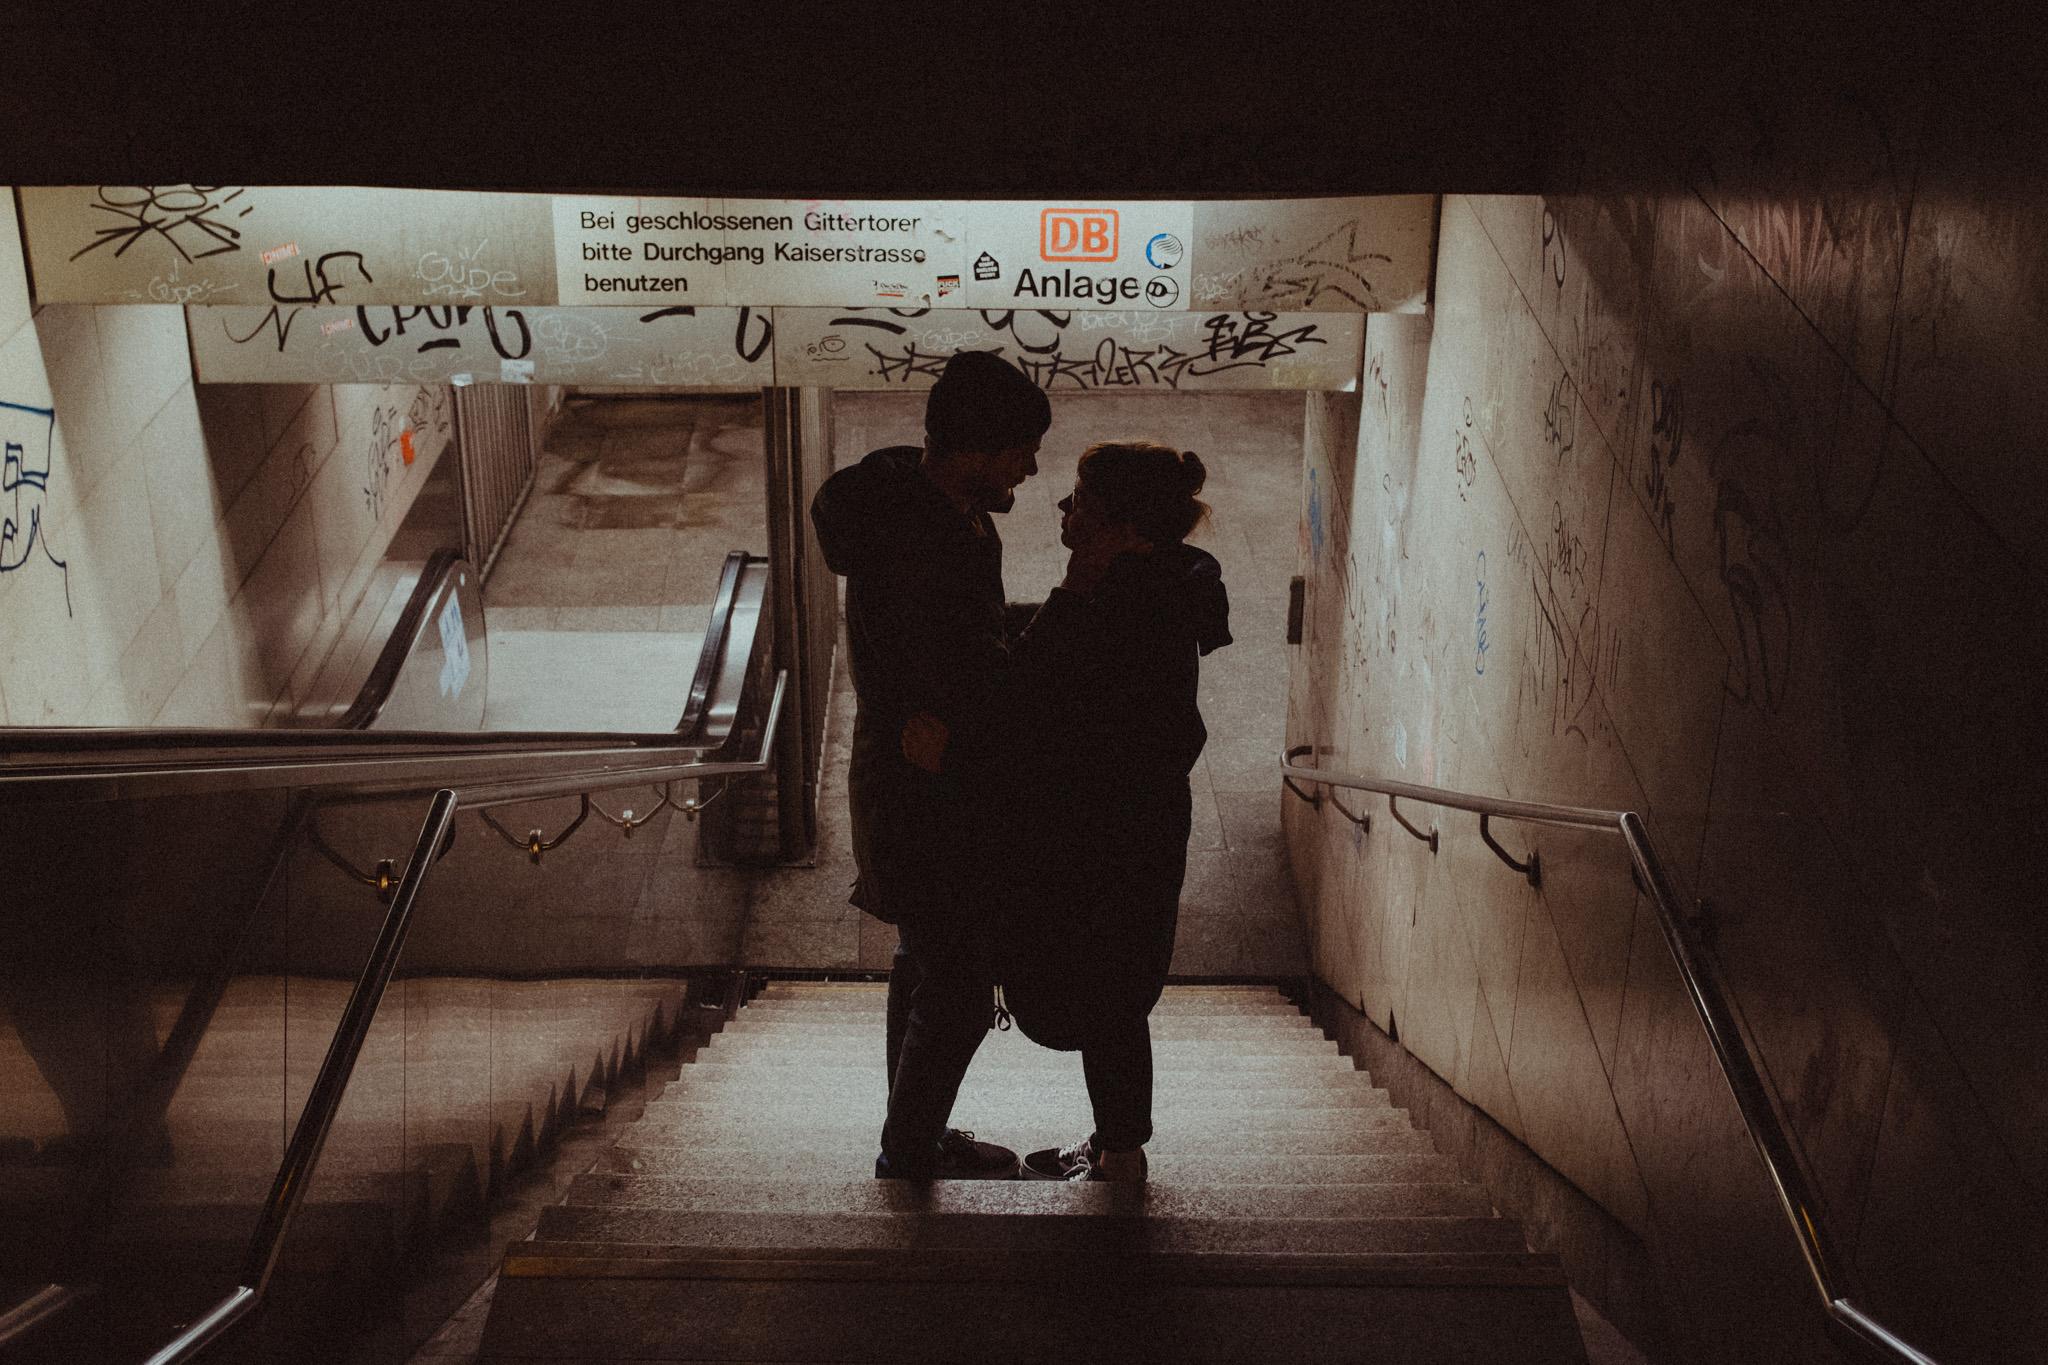 FRANKFURT-WEDDING-PHOTOGRAPHER-22.jpg